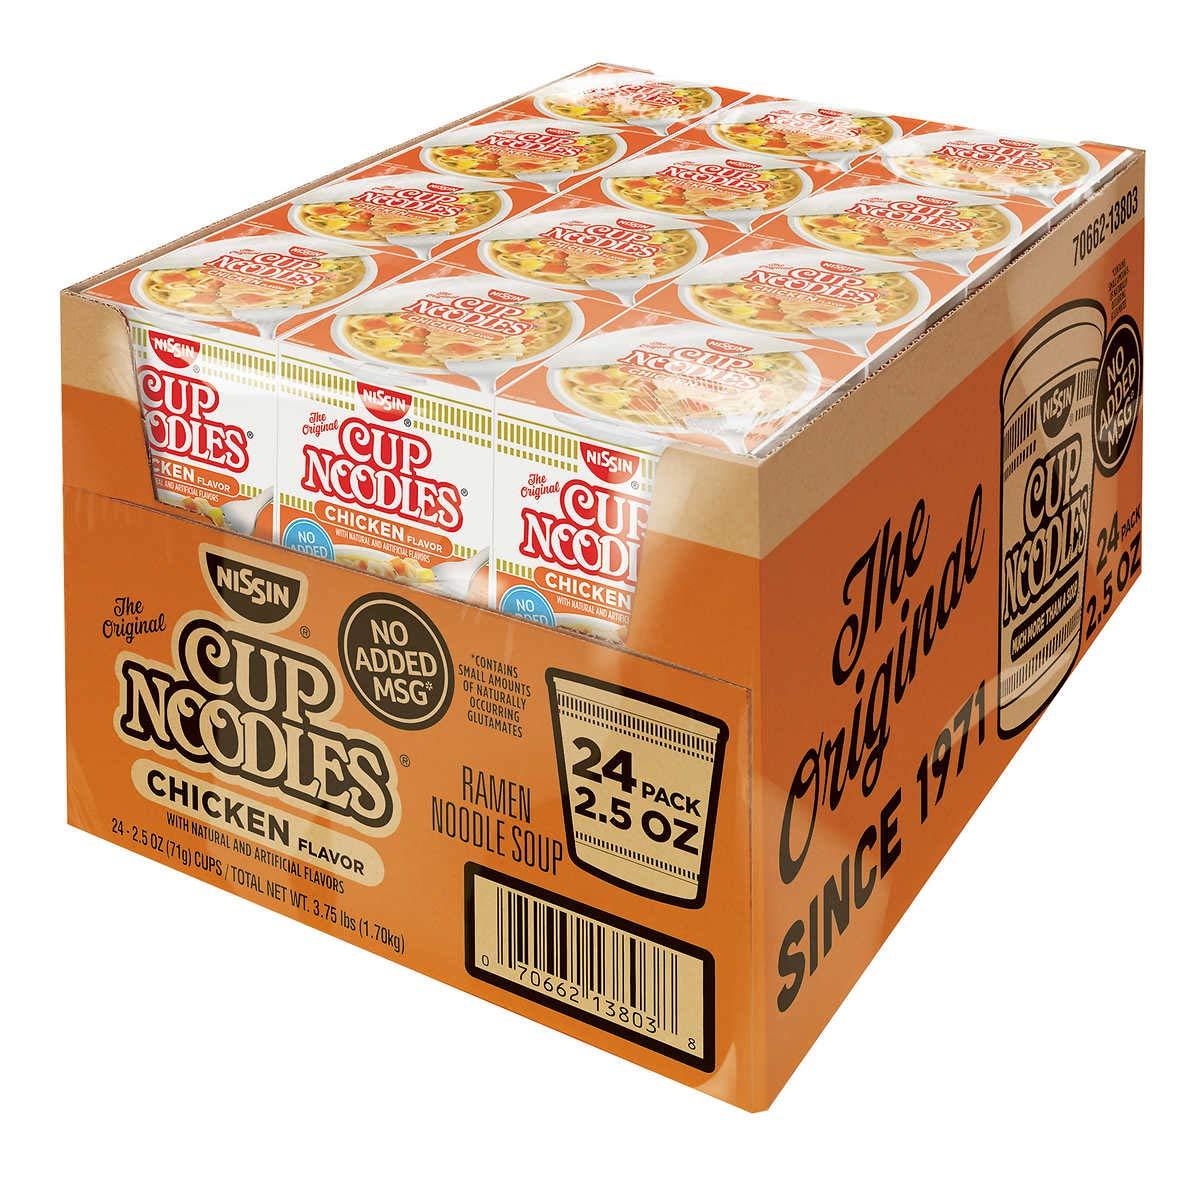 Nissin Cup Noodles Ramen Noodle Soup, Chicken Flavor 2.25 Ounce (Pack of 24)